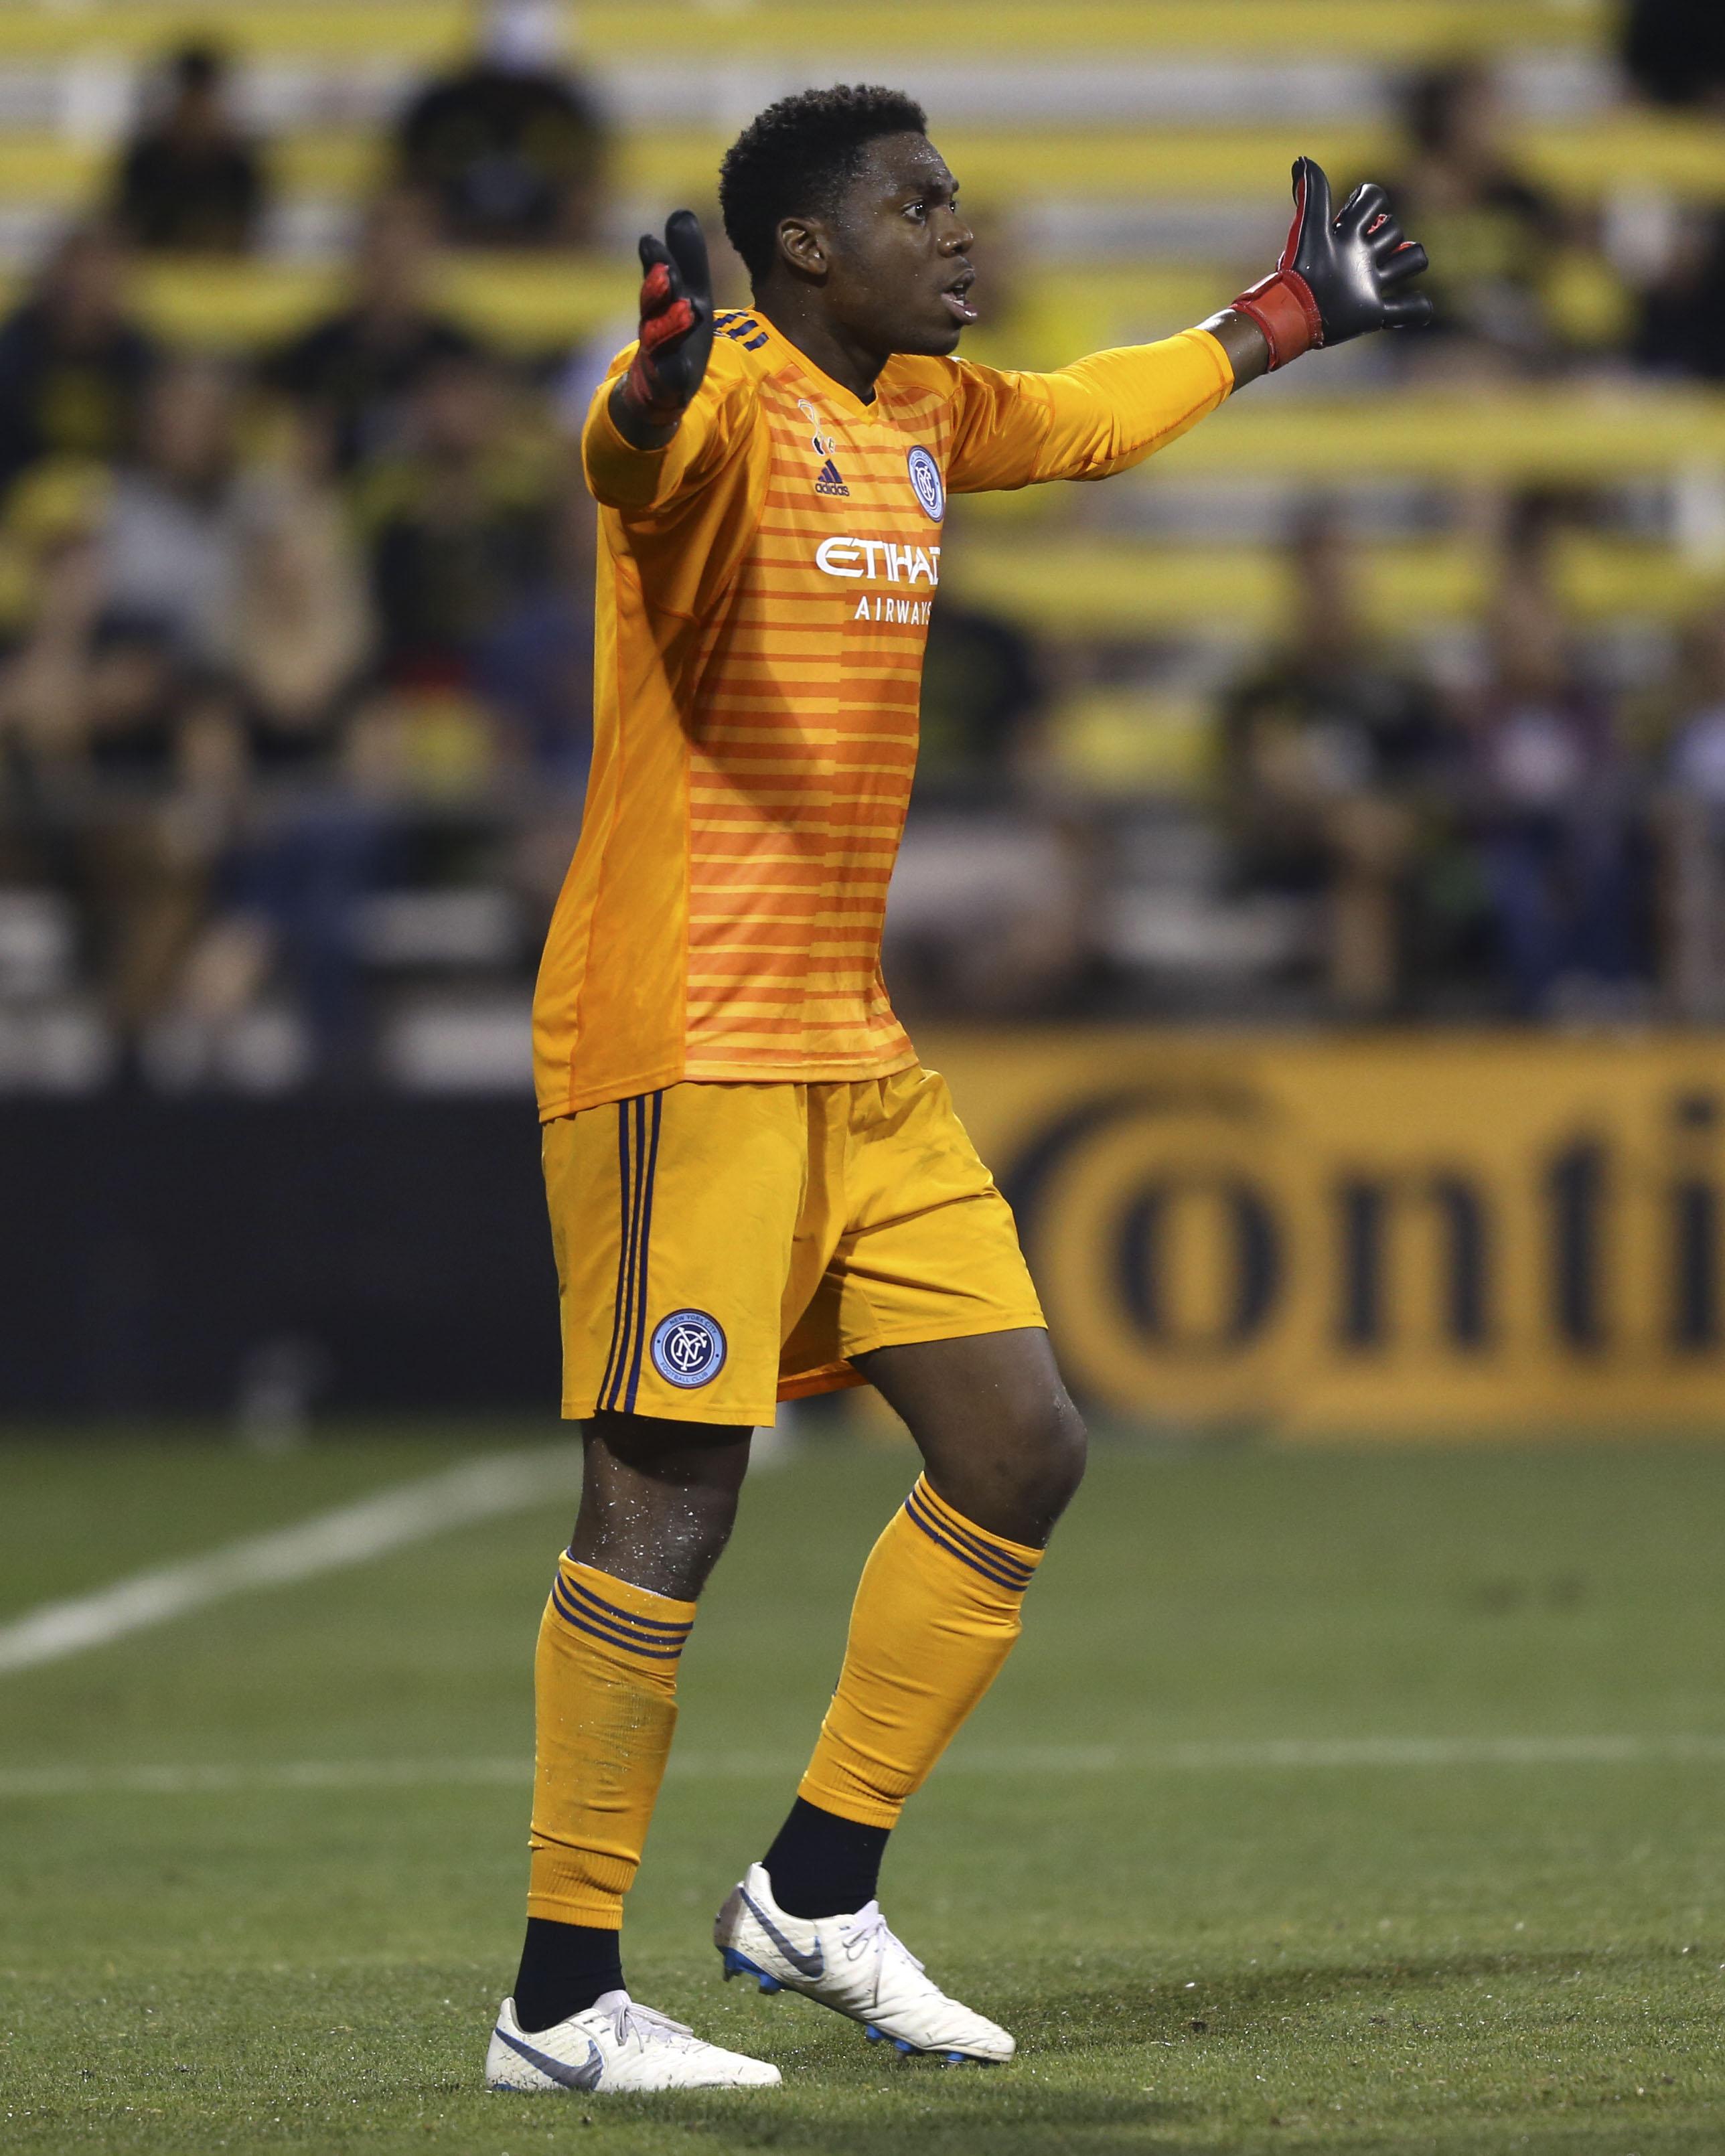 MLS - New York City FC - Sean Johnson